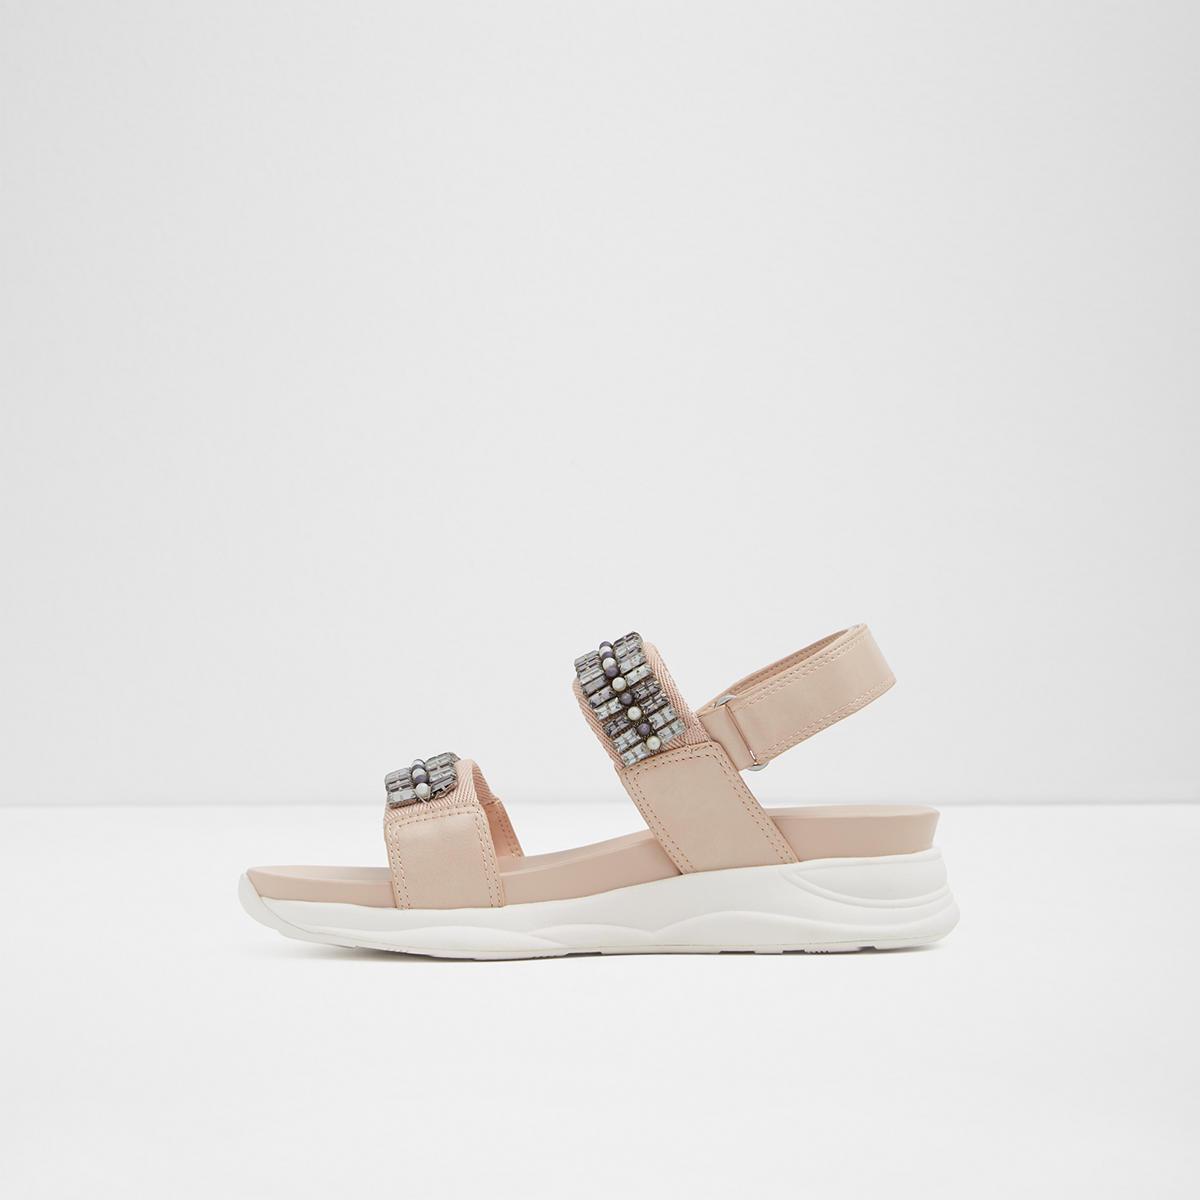 ALDO Eloima Bling Strap Wedge Sandals 9nEWNQYxS